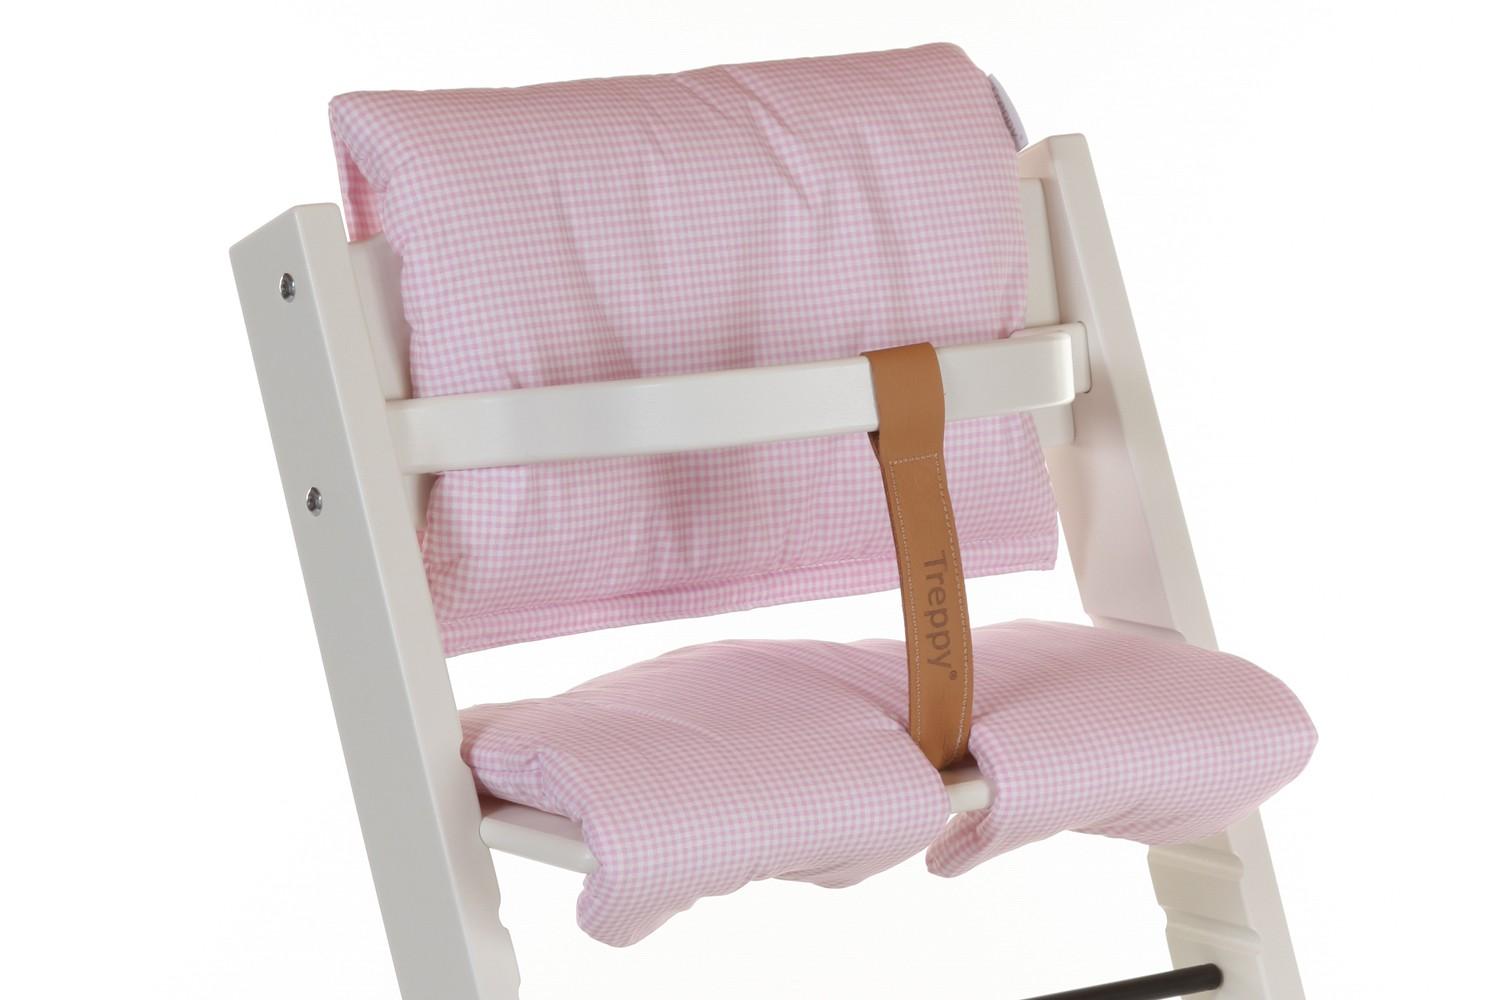 treppy sitzverkleinerer verkleinerer kissen f r hochstuhl treppenhochstuhl neu ebay. Black Bedroom Furniture Sets. Home Design Ideas